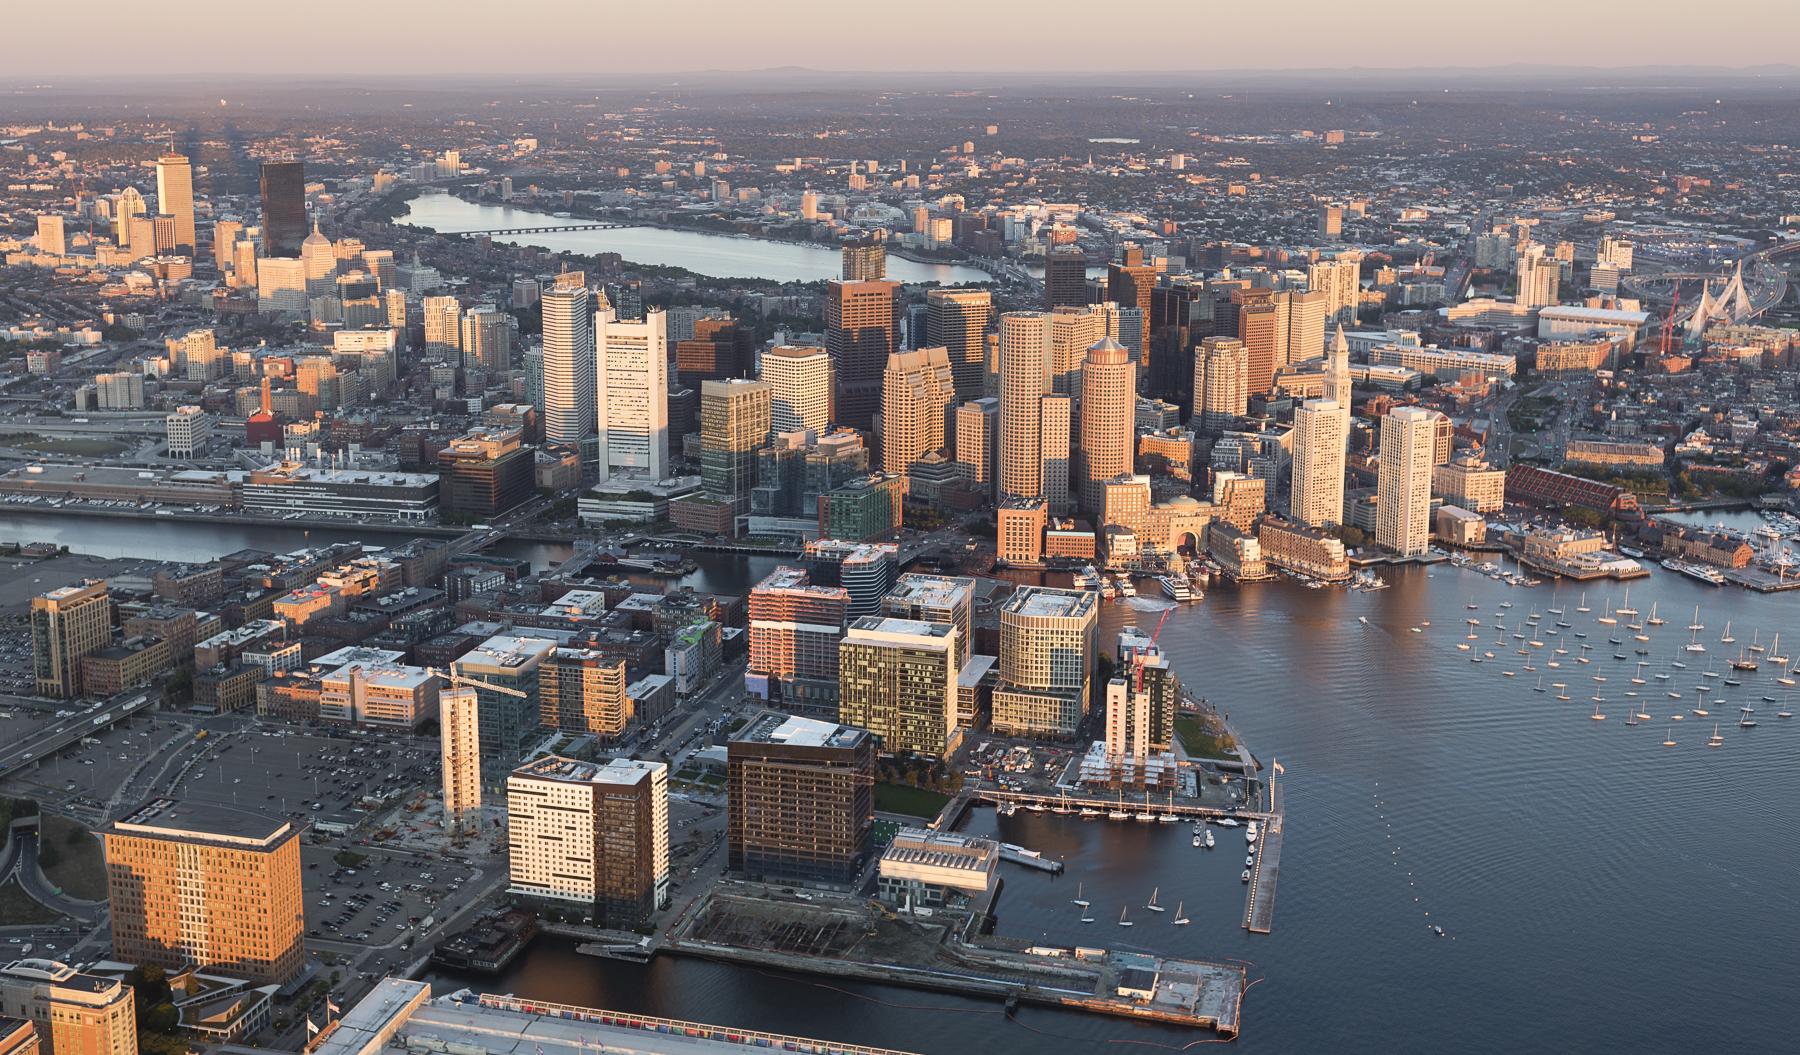 Boston Seaport aerial view sunrise